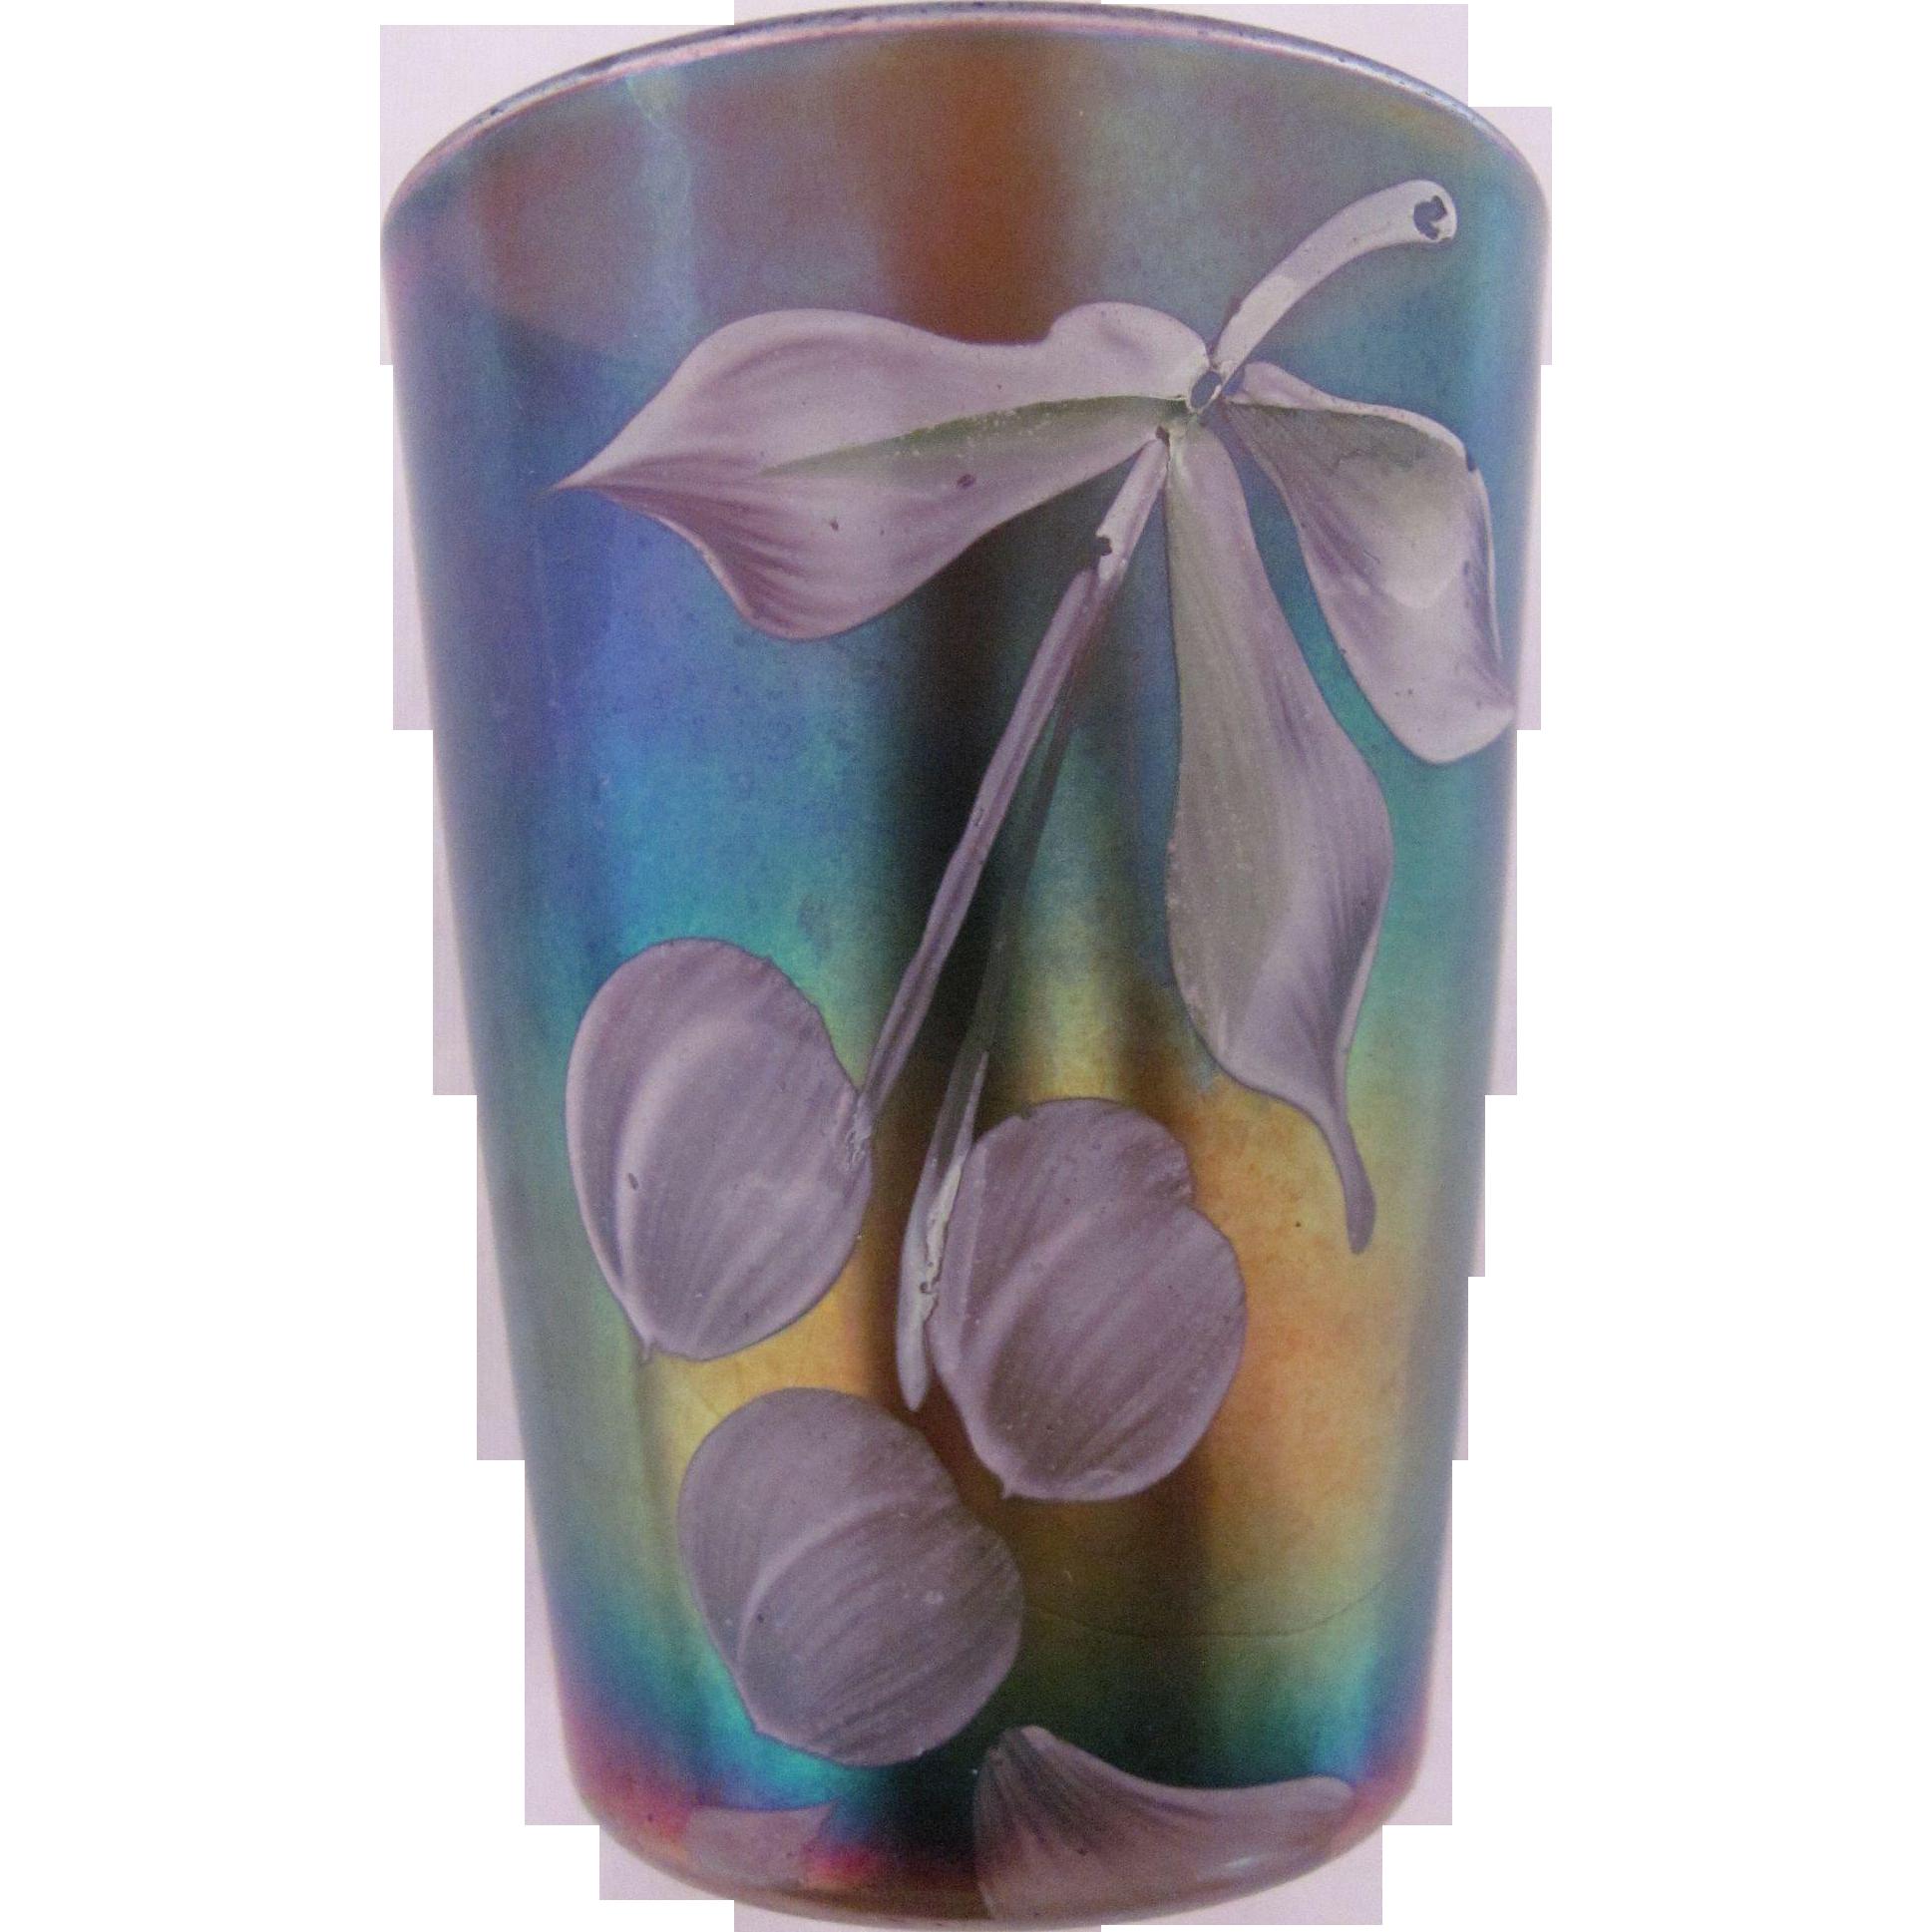 Northwood Carnival Glass Tumbler Cobalt Blue Hand Painted Cherries & Flowers